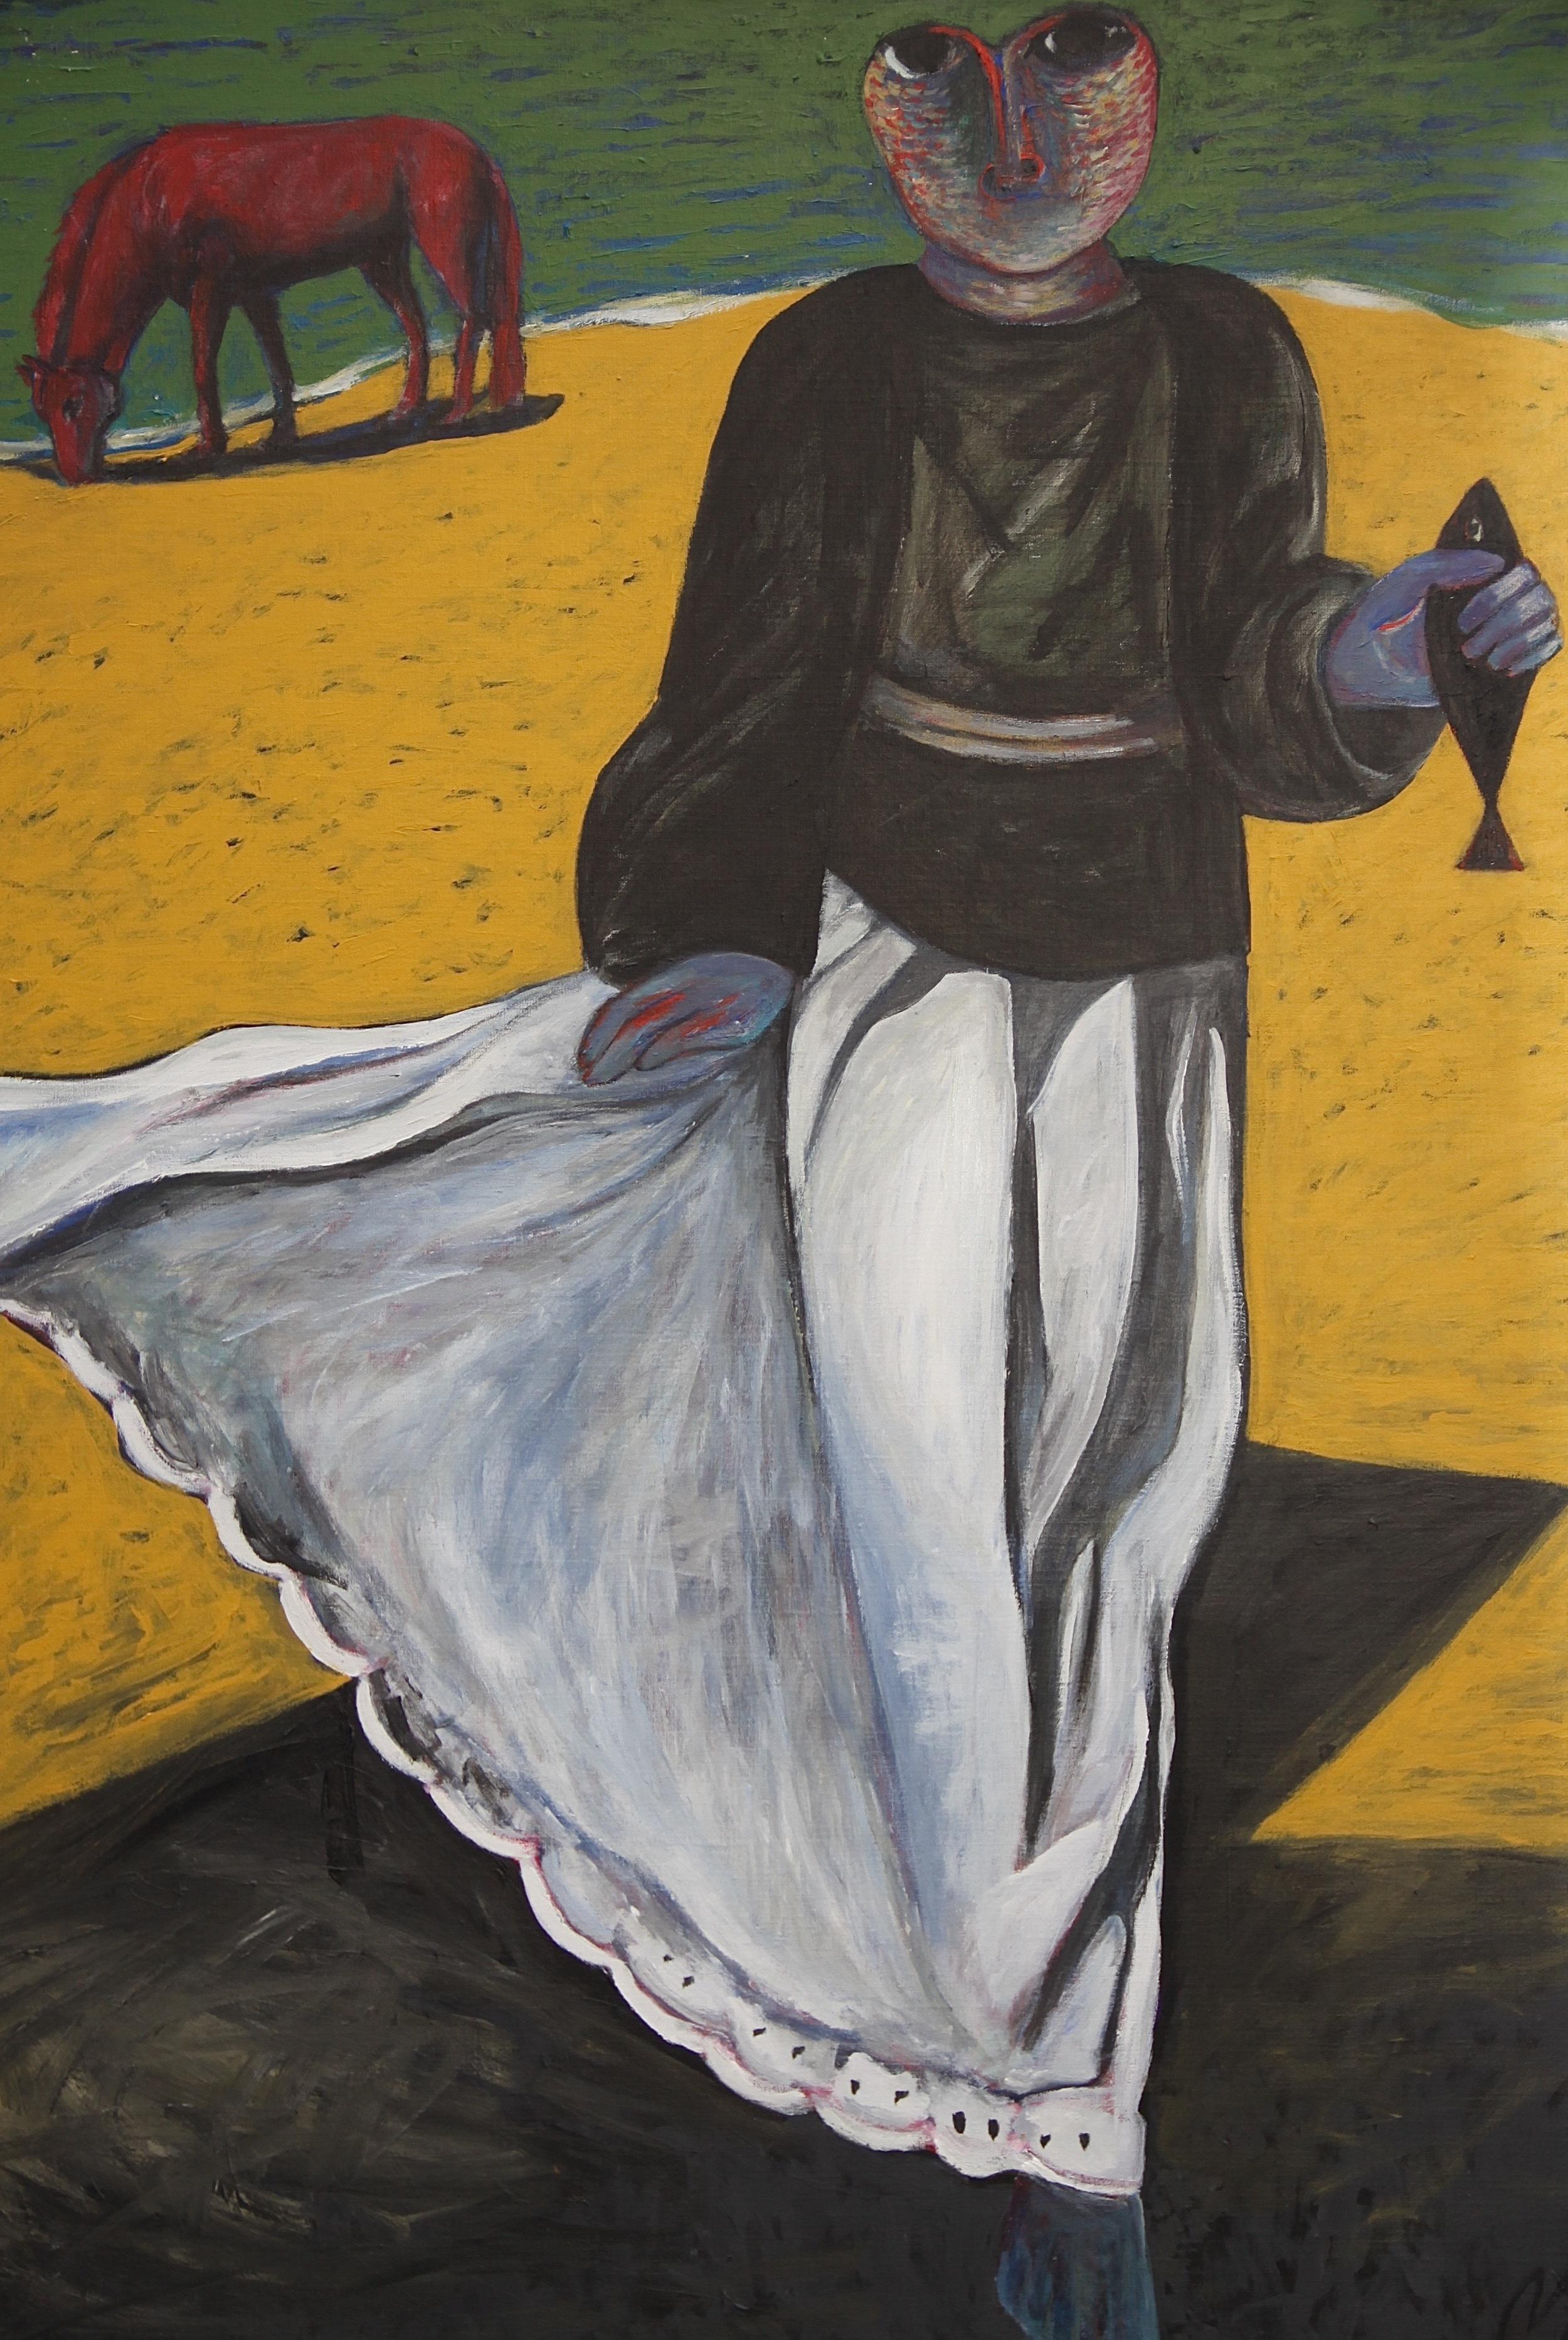 Ahmed Morsi, Black Fish,1984,Acrylic on canvas,152 x 132 cm.